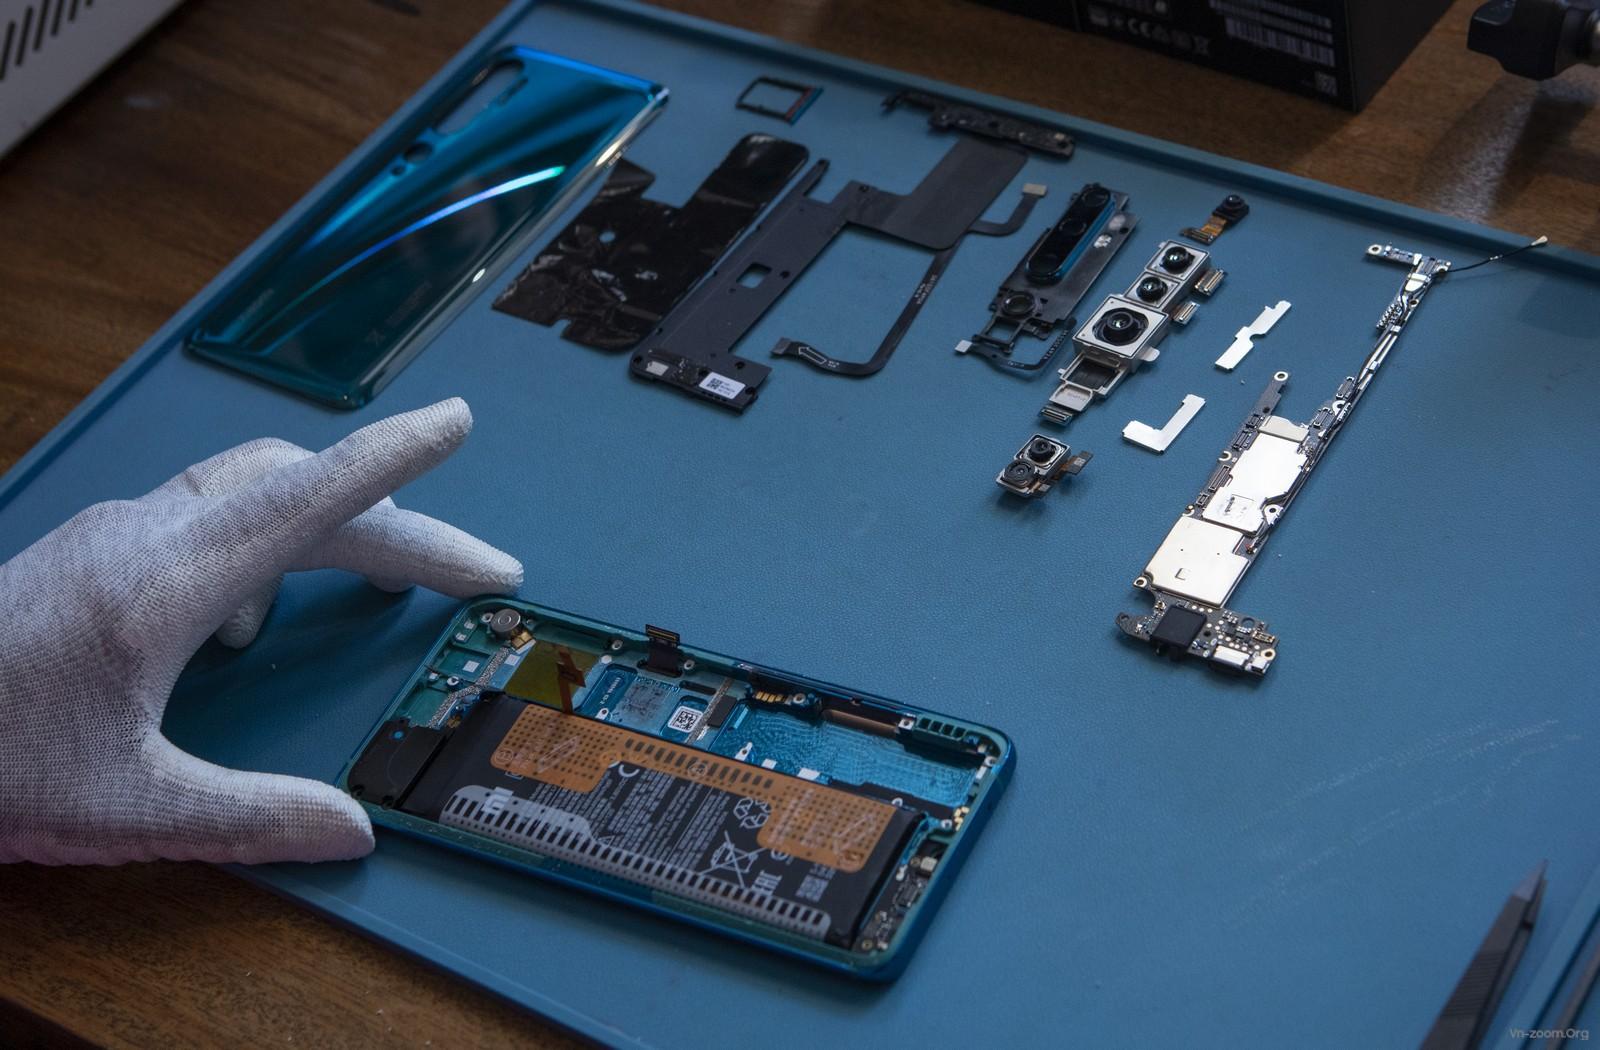 191217-Xiaomi-Mi-Note-10-Teardown-009.jpg